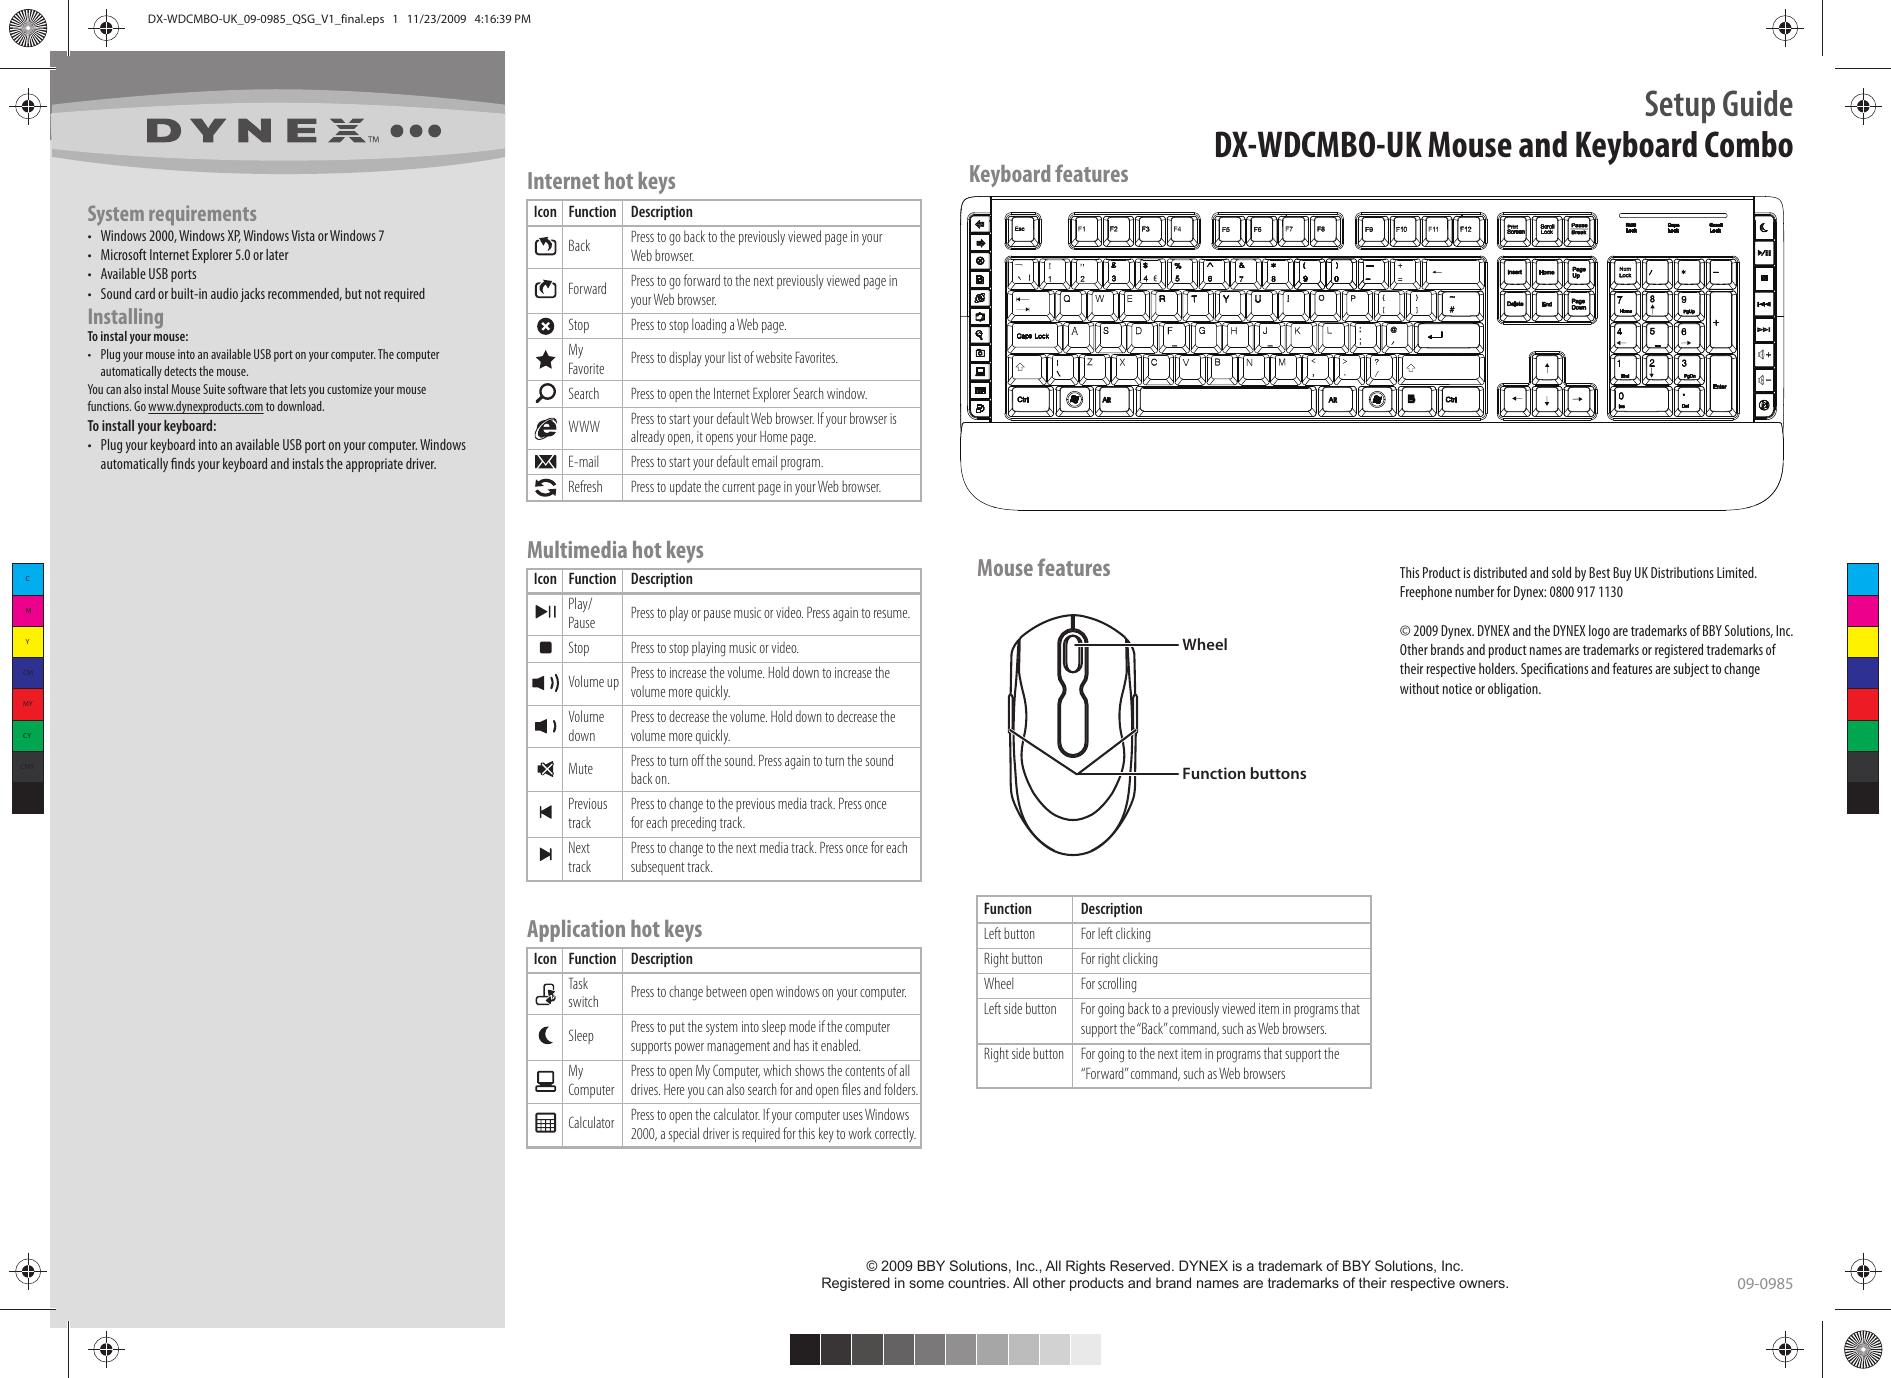 DYNEX DX-WDCMBO TREIBER WINDOWS 7